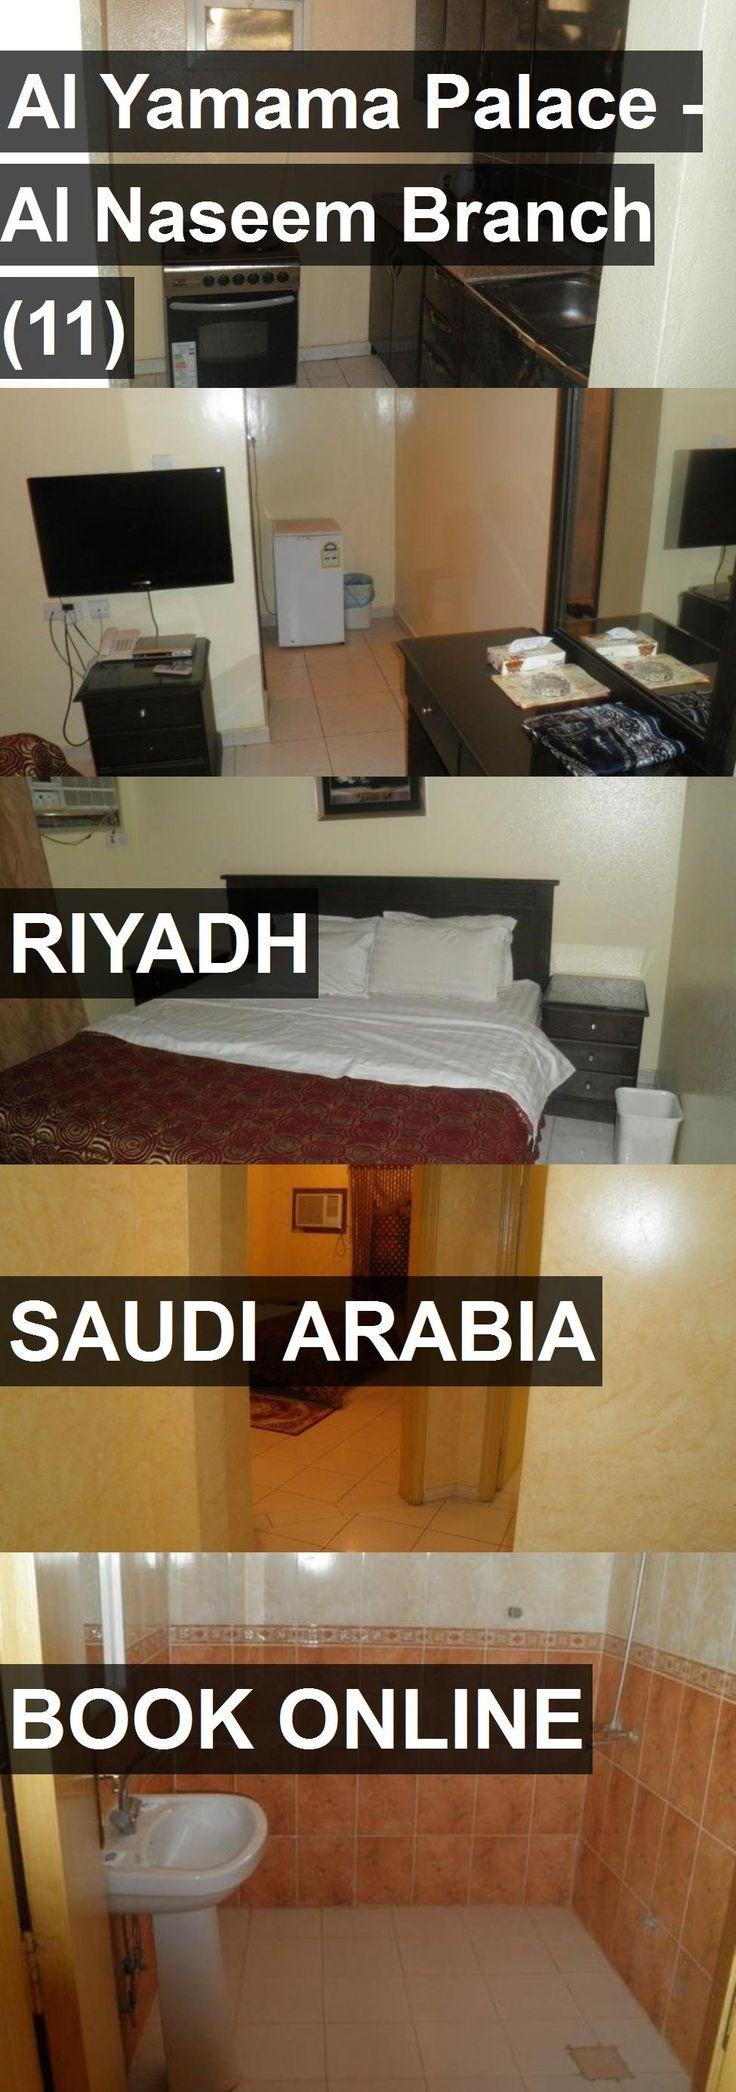 Hotel Al Yamama Palace - Al Naseem Branch (11) in Riyadh, Saudi Arabia. For more information, photos, reviews and best prices please follow the link. #SaudiArabia #Riyadh #travel #vacation #hotel